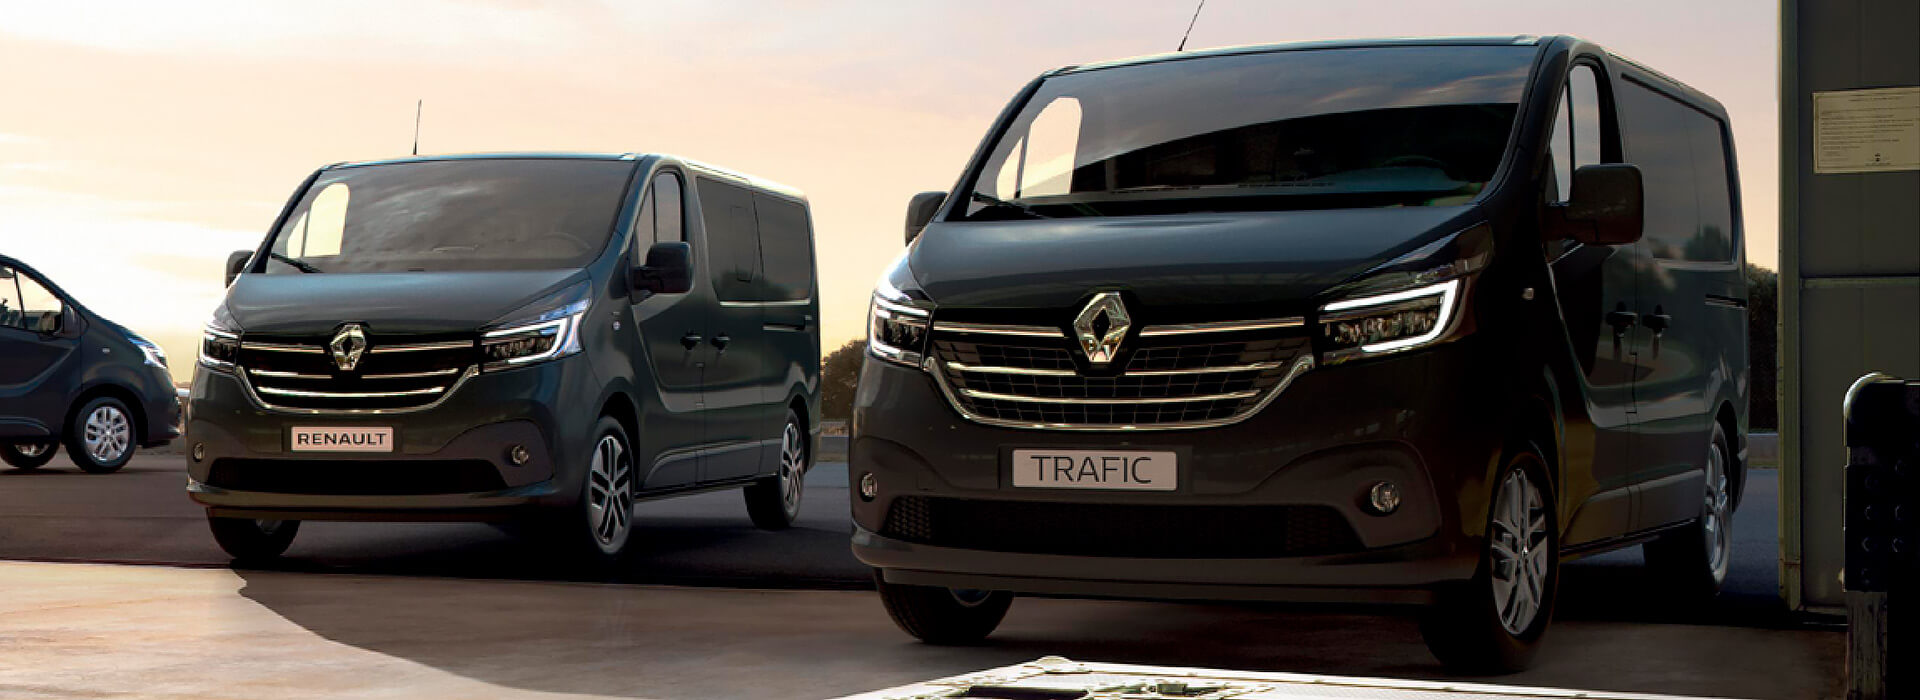 Trinity Renault Finance